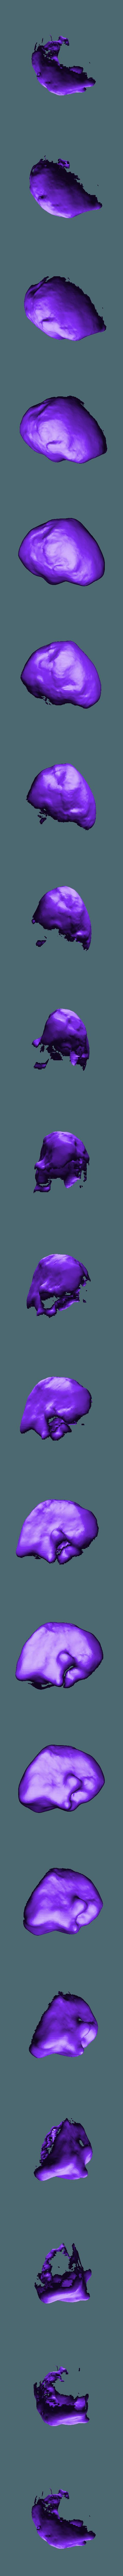 Africanus_brain.stl Download free STL file Australopithicus Africanus (Taung Child Skull Fragment) • Object to 3D print, sjpiper145